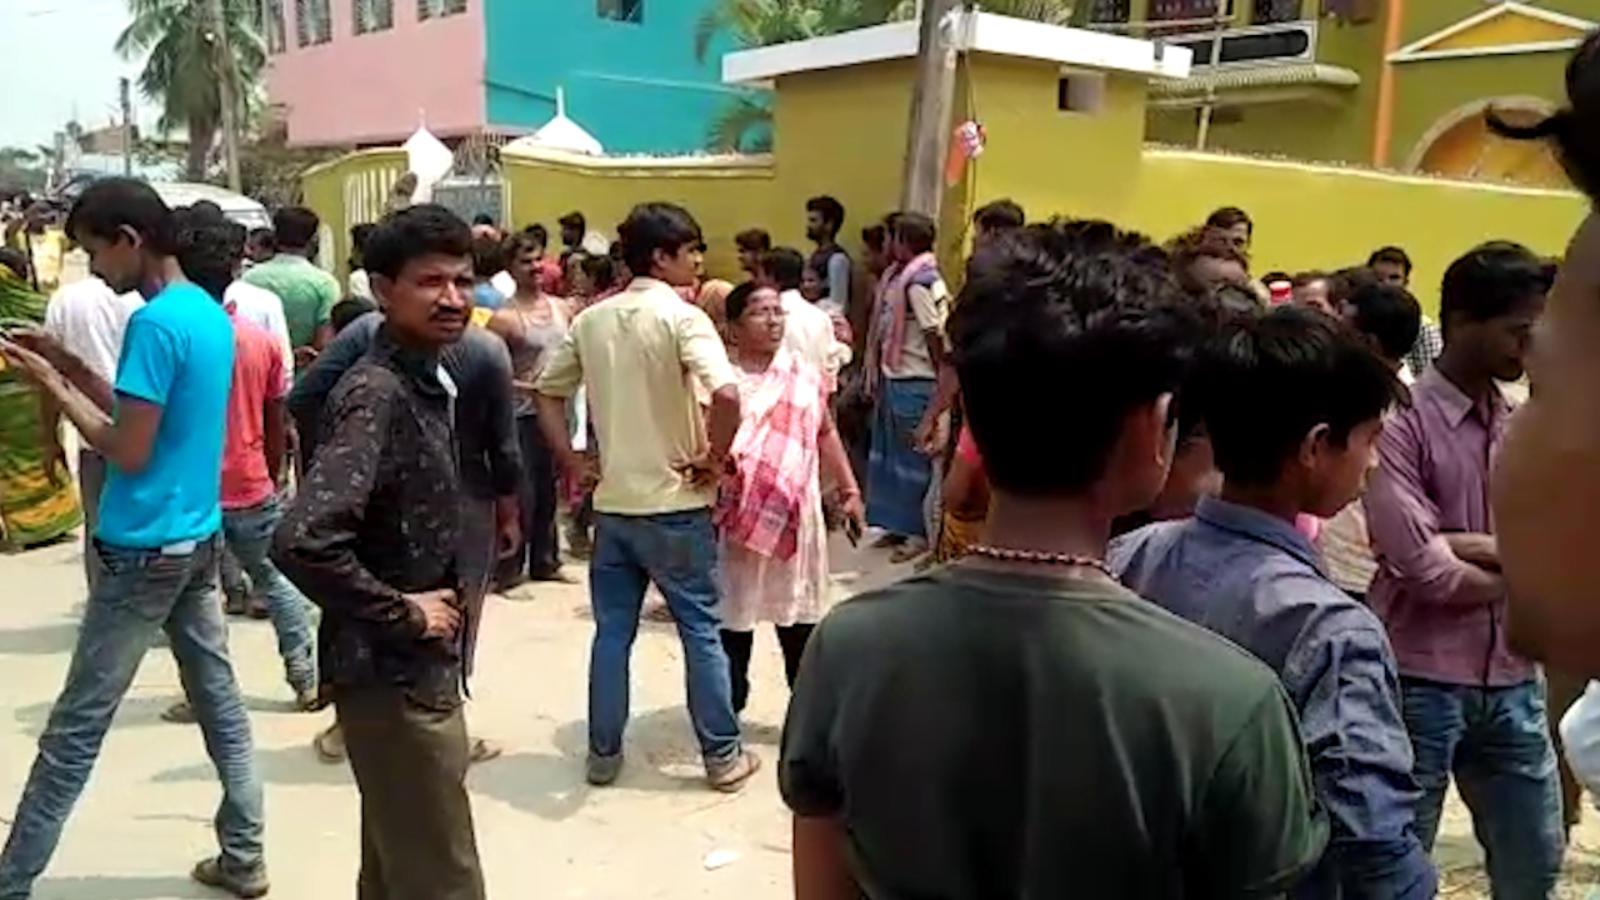 lok-sabha-2019-tmc-and-bjp-workers-clash-during-polling-in-malda